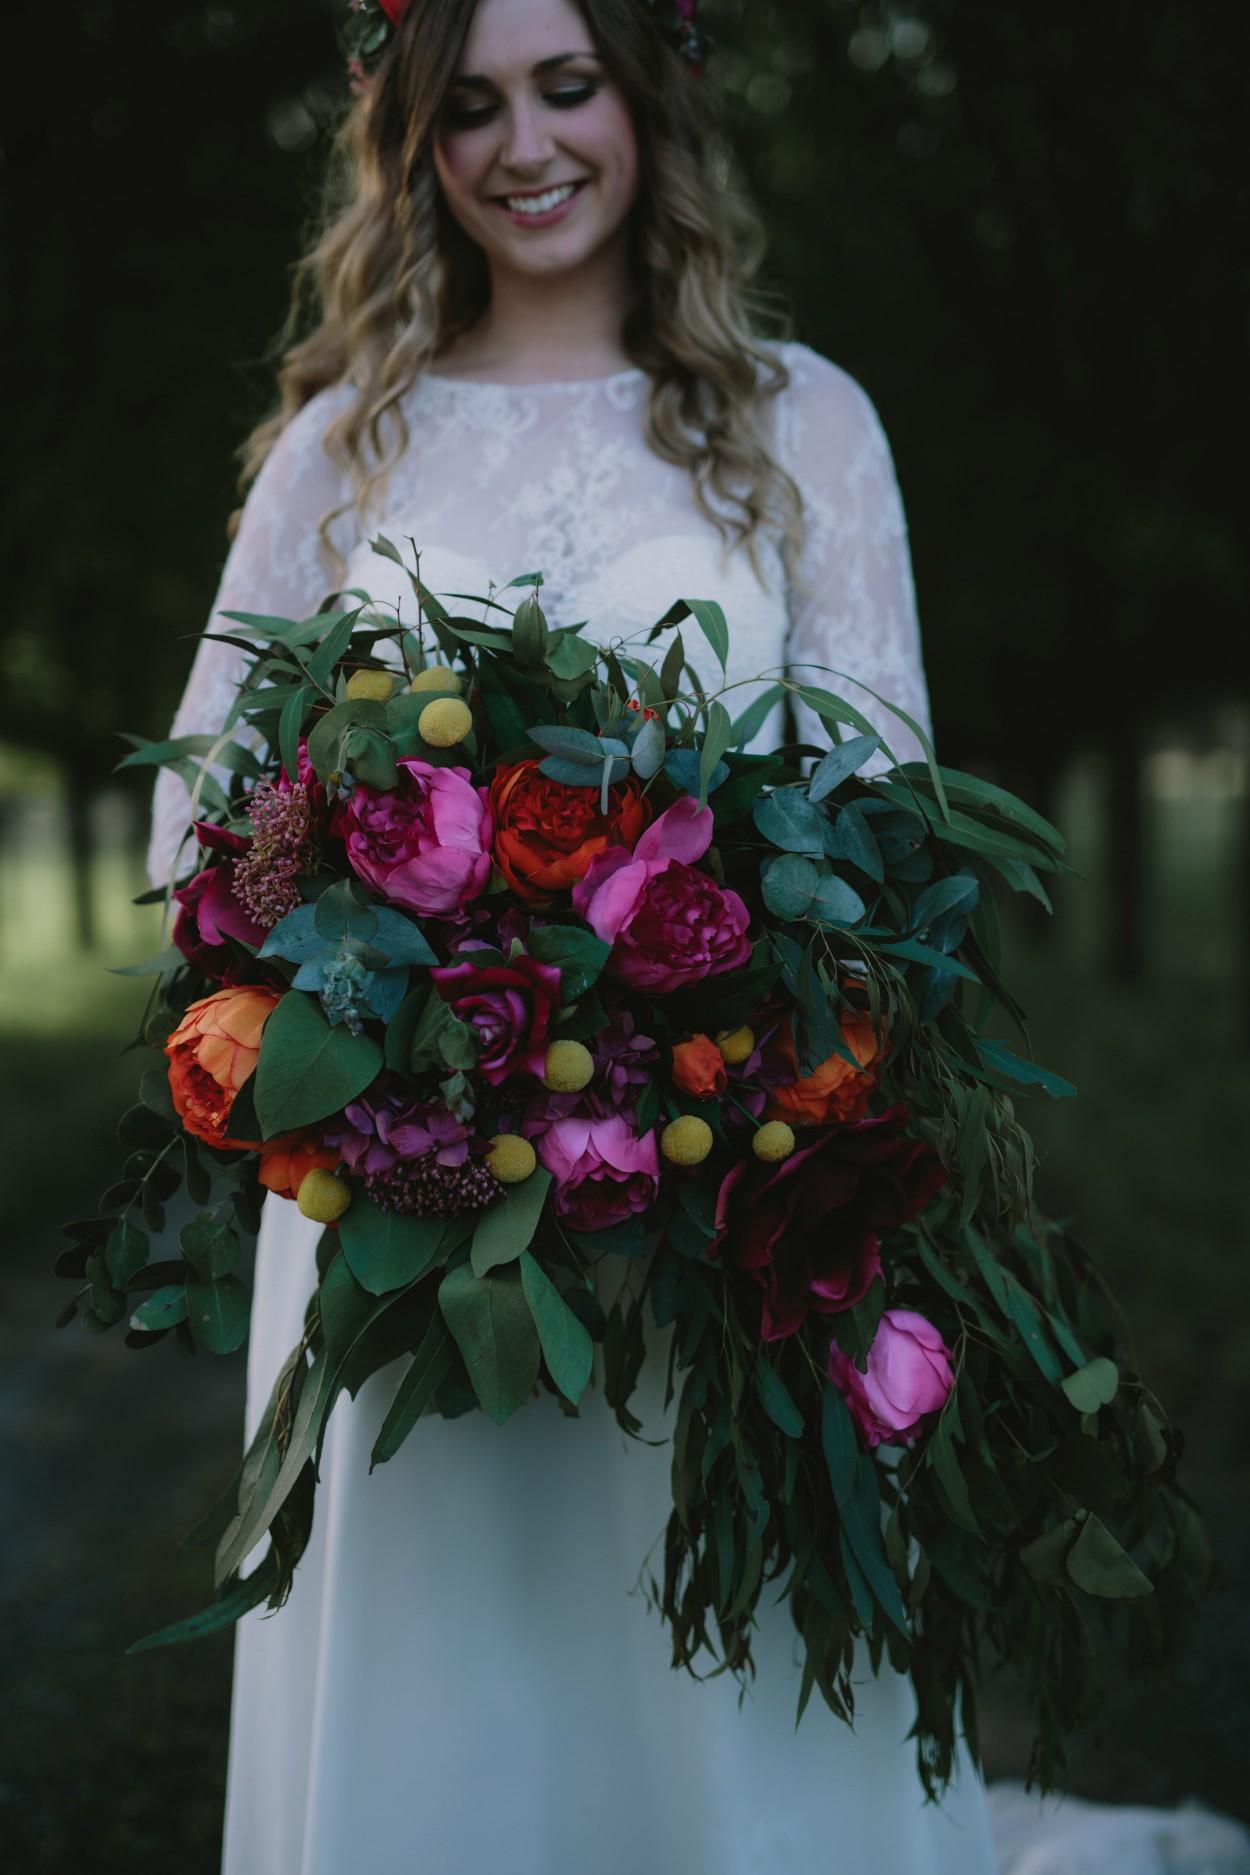 I-Got-You-Babe-&-Co.-Wedding-Photographers-Elsa011.jpg